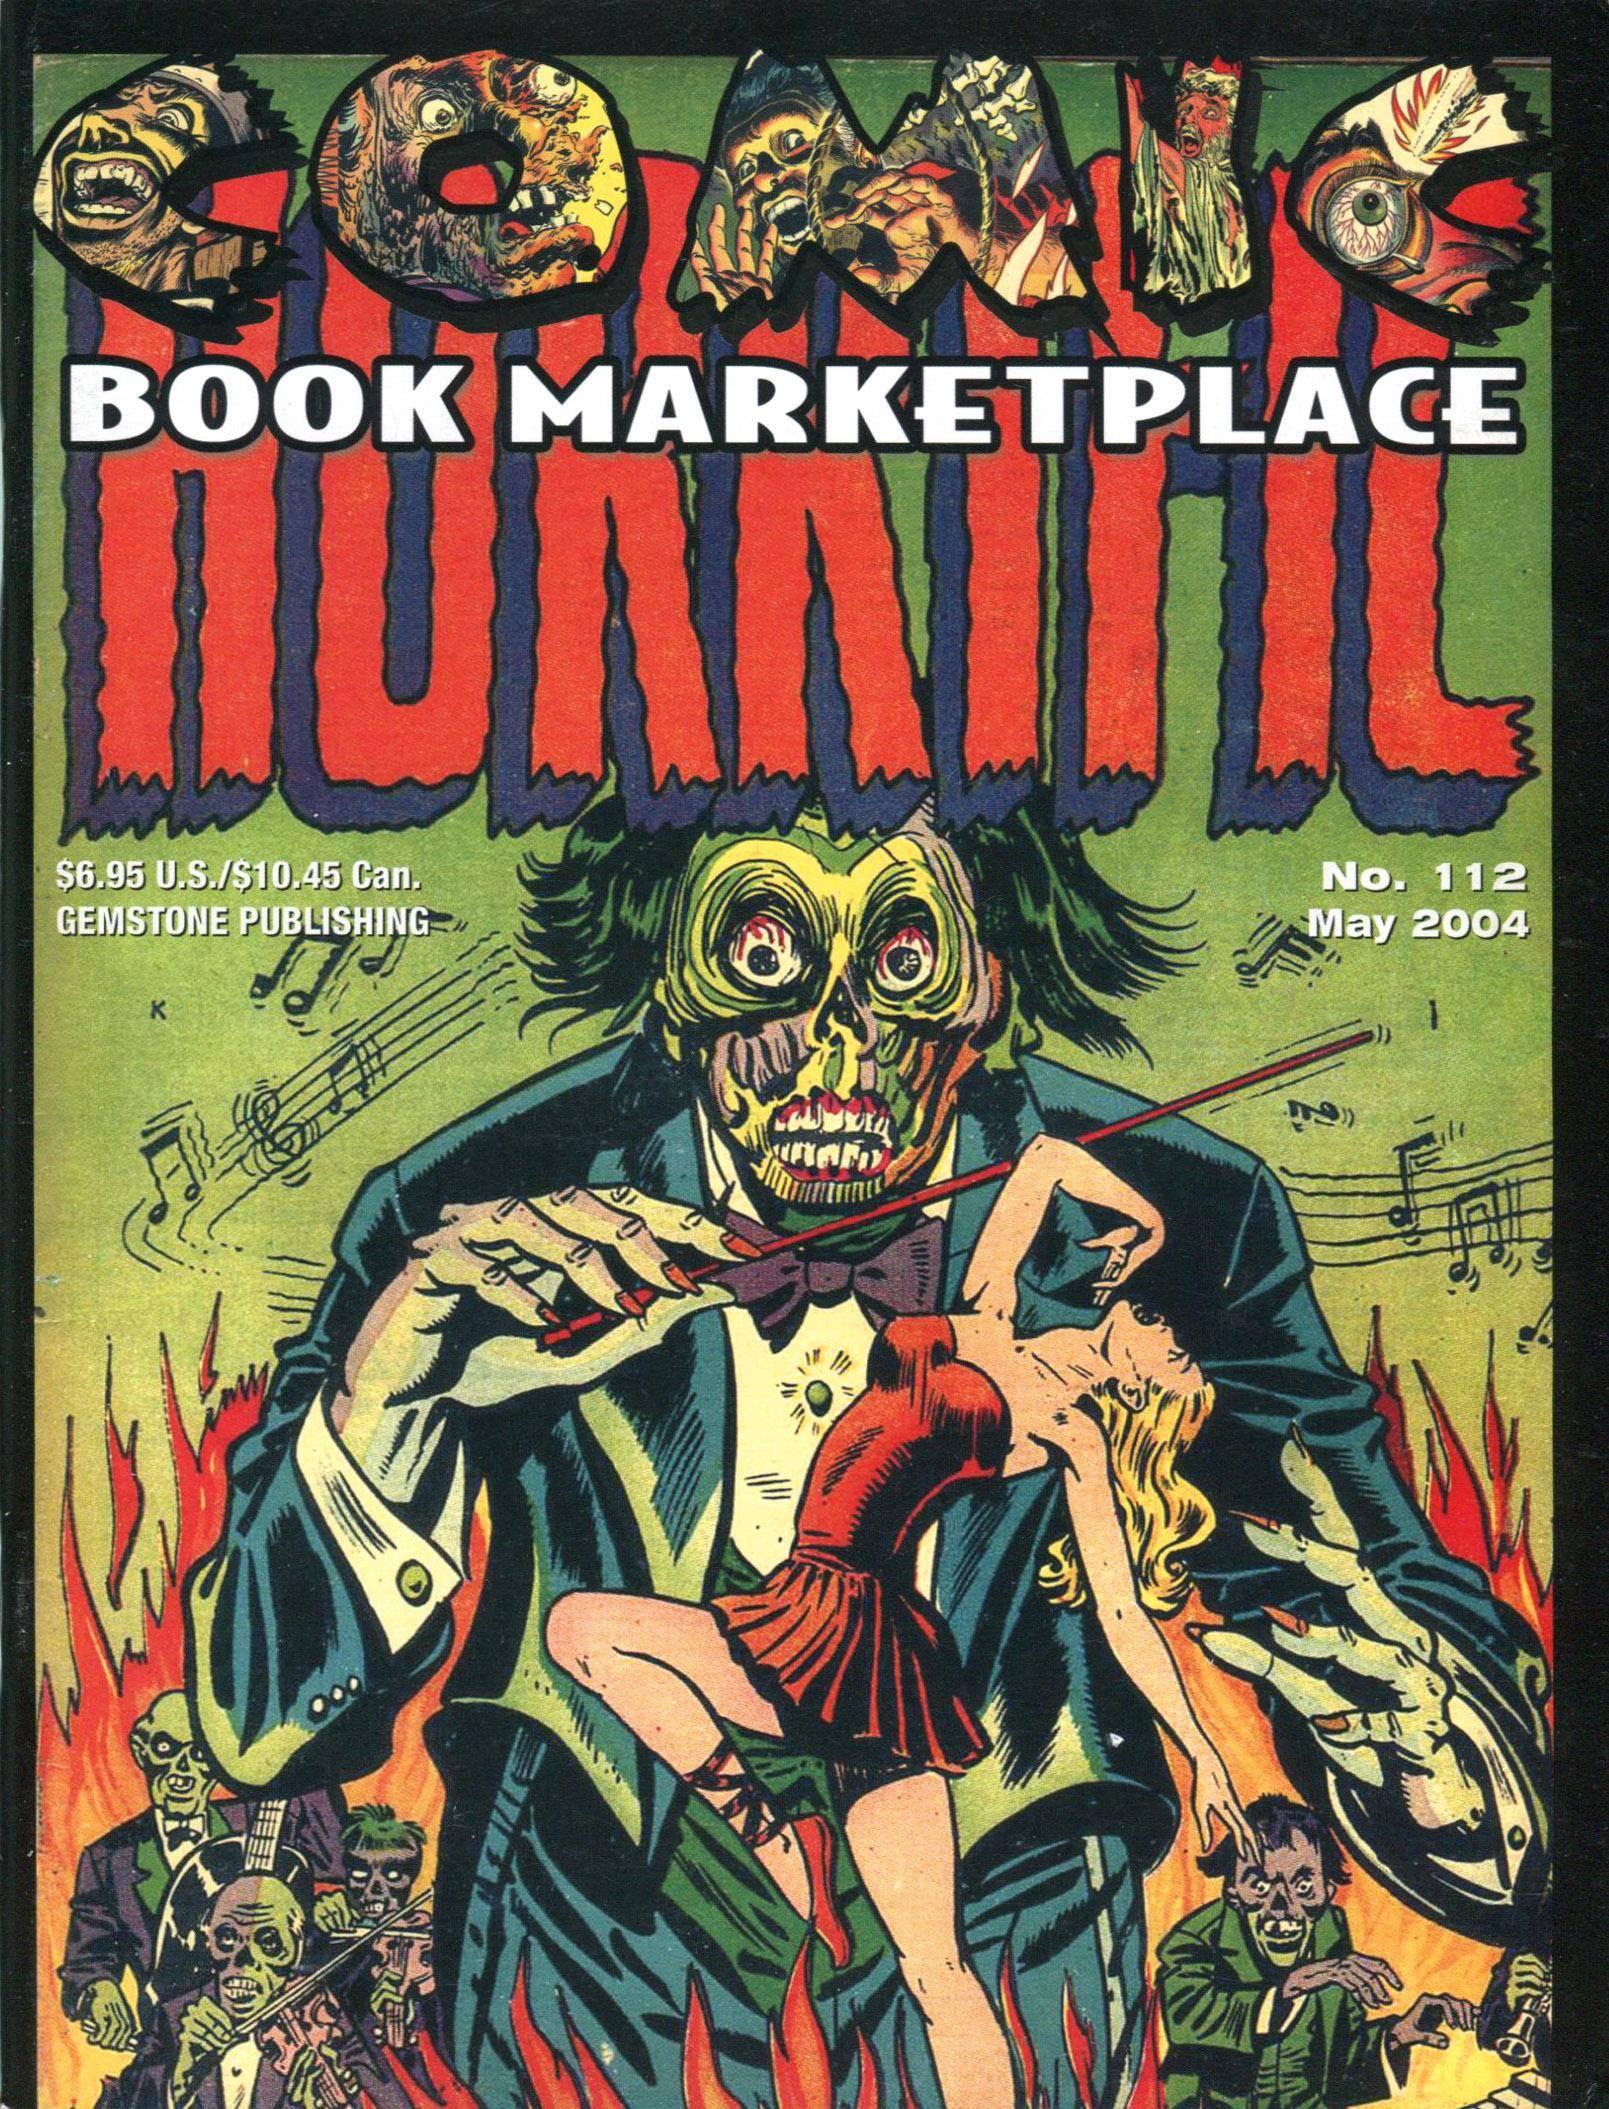 Comic Book Marketplace 112 2004